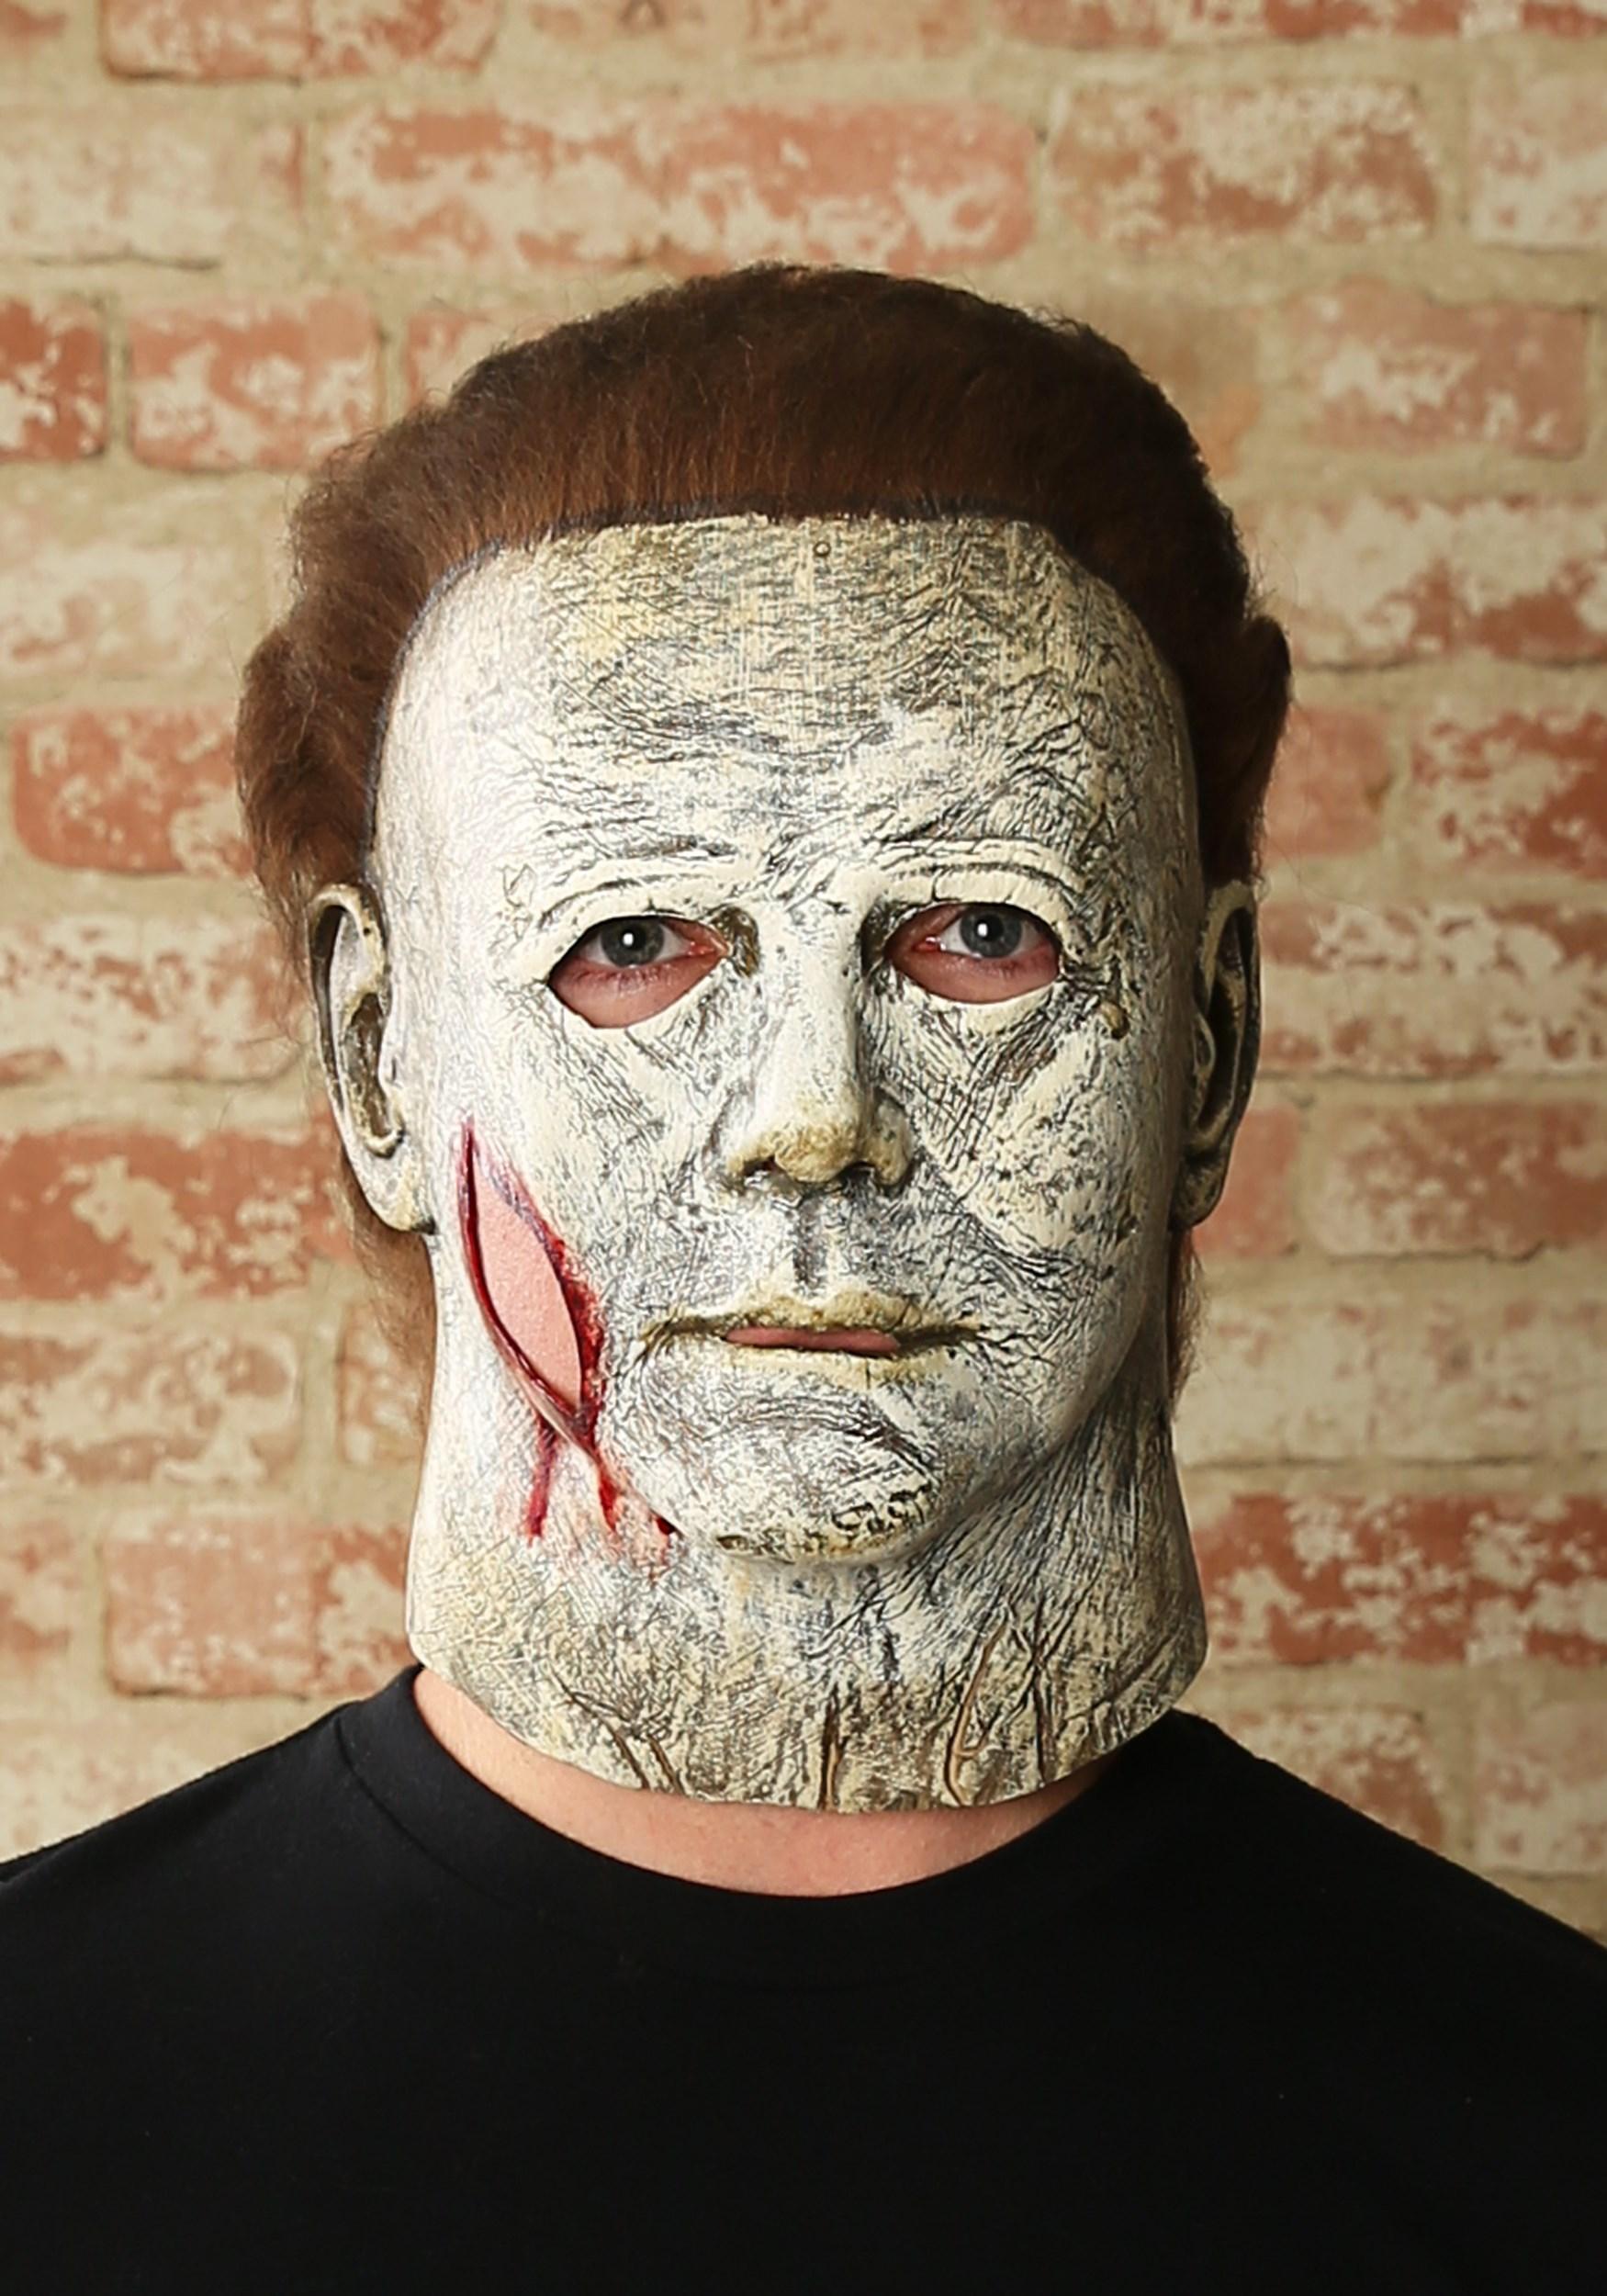 Halloween 2020 - Michael Myers Mask Michael Myers Halloween (2018) Final Battle Mask